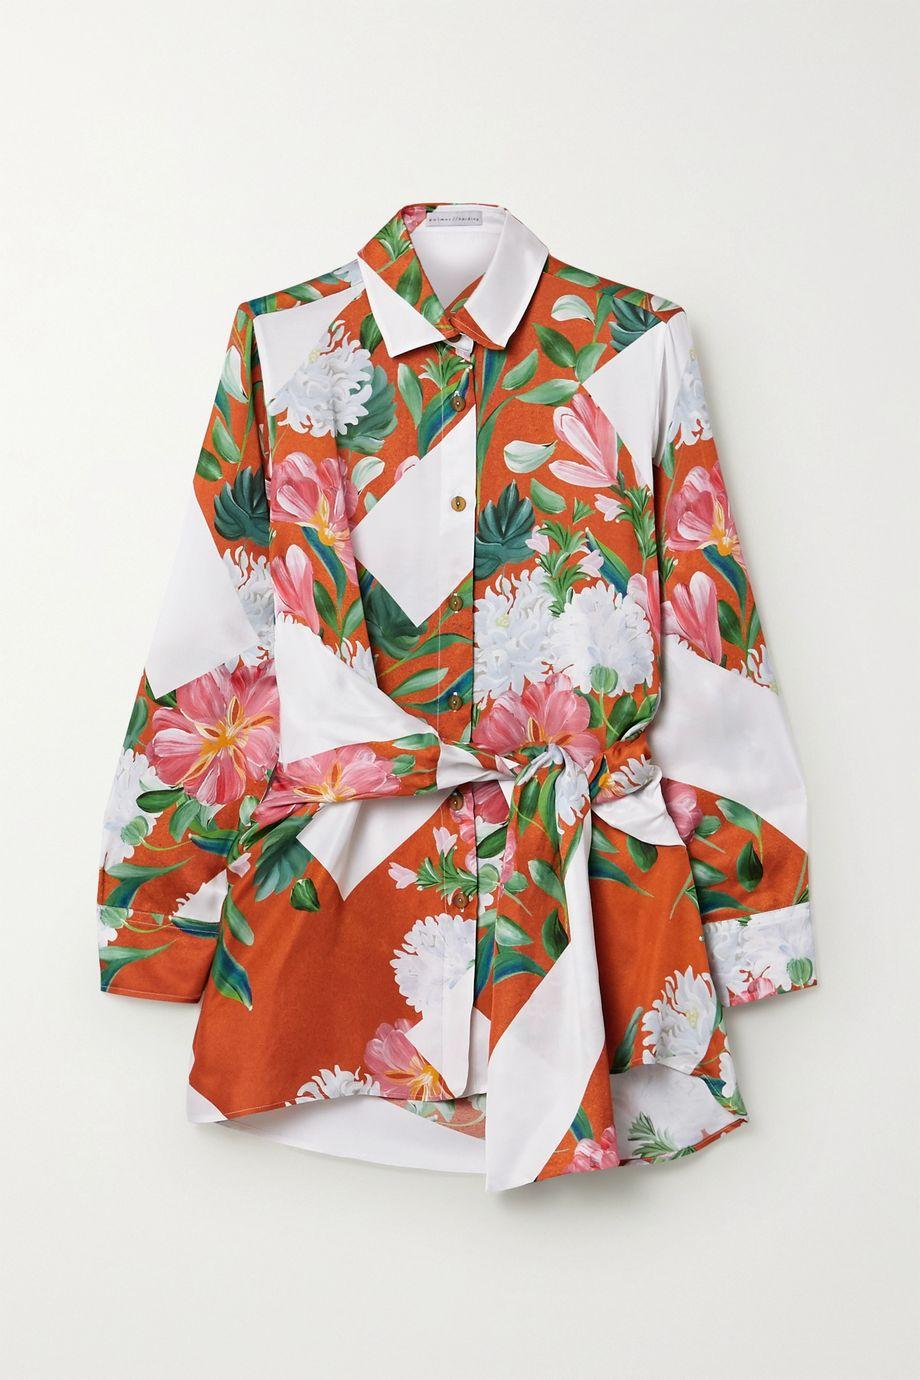 palmer//harding Julia belted printed satin-twill shirt